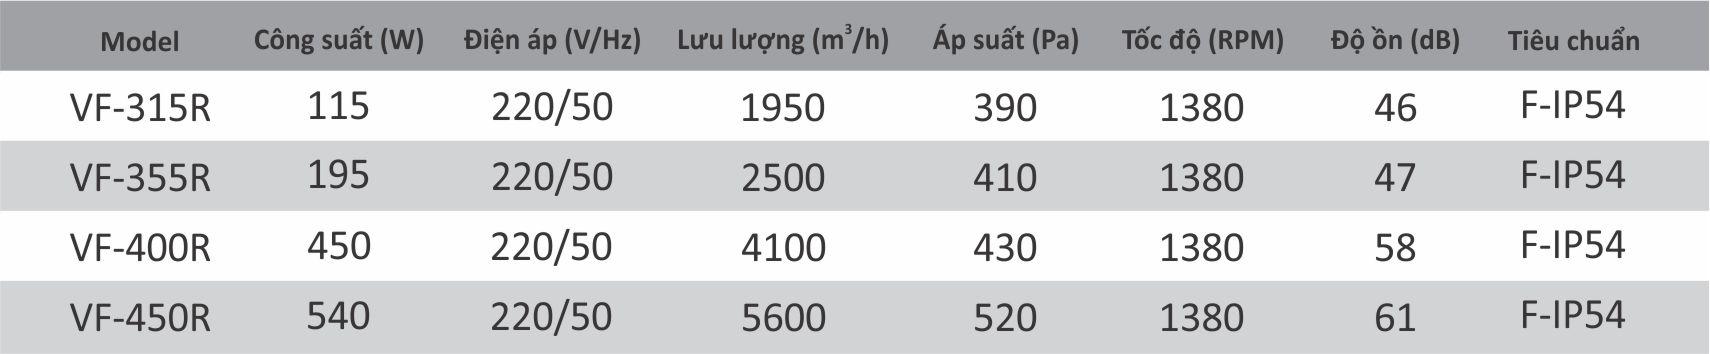 Quat-Thong-Gio-Mai-Nha-Gieng-Troi-VF-R-tskt-2